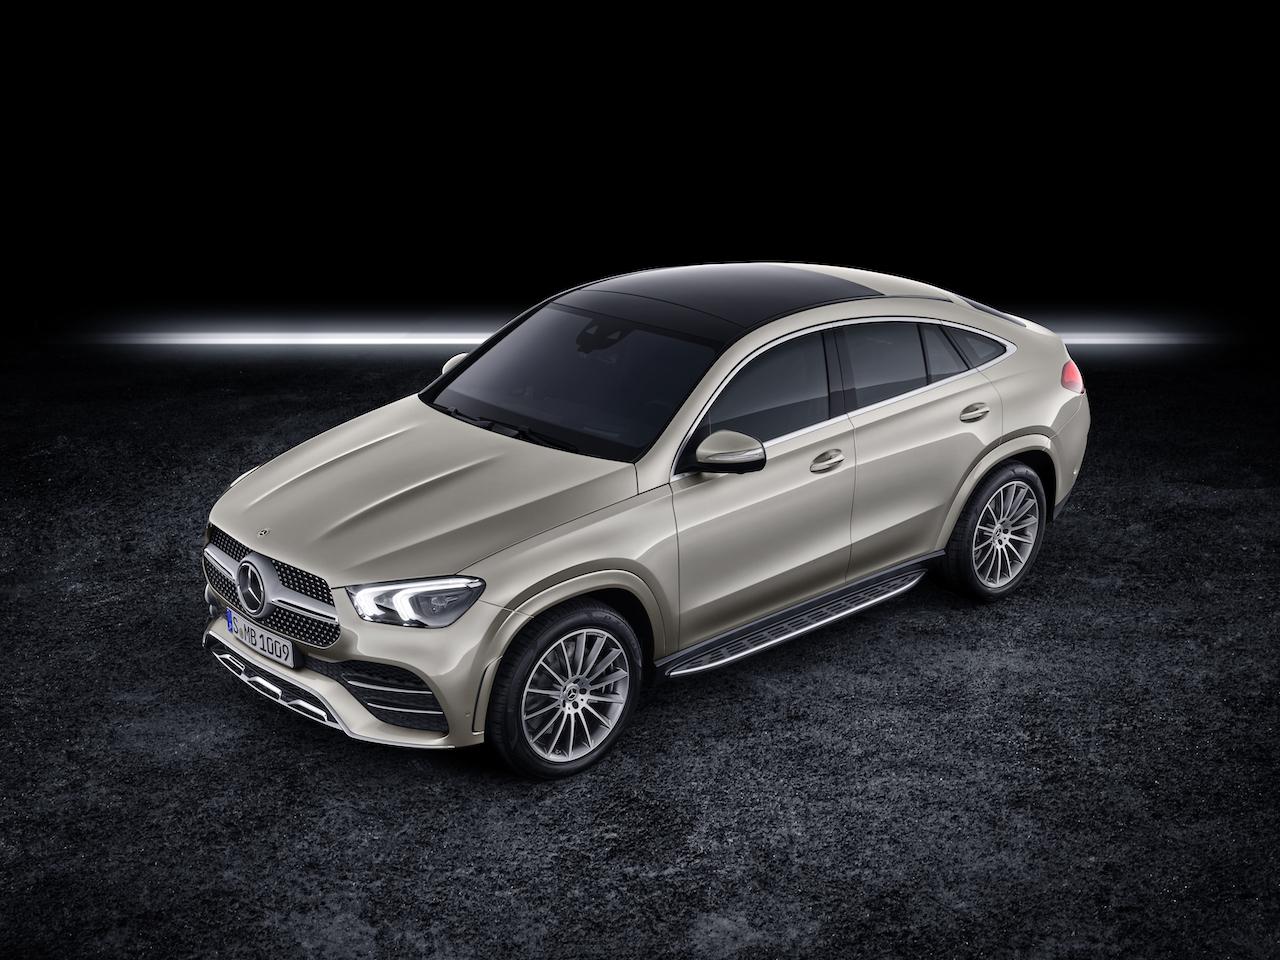 gle-coupe-2020-00001.jpg